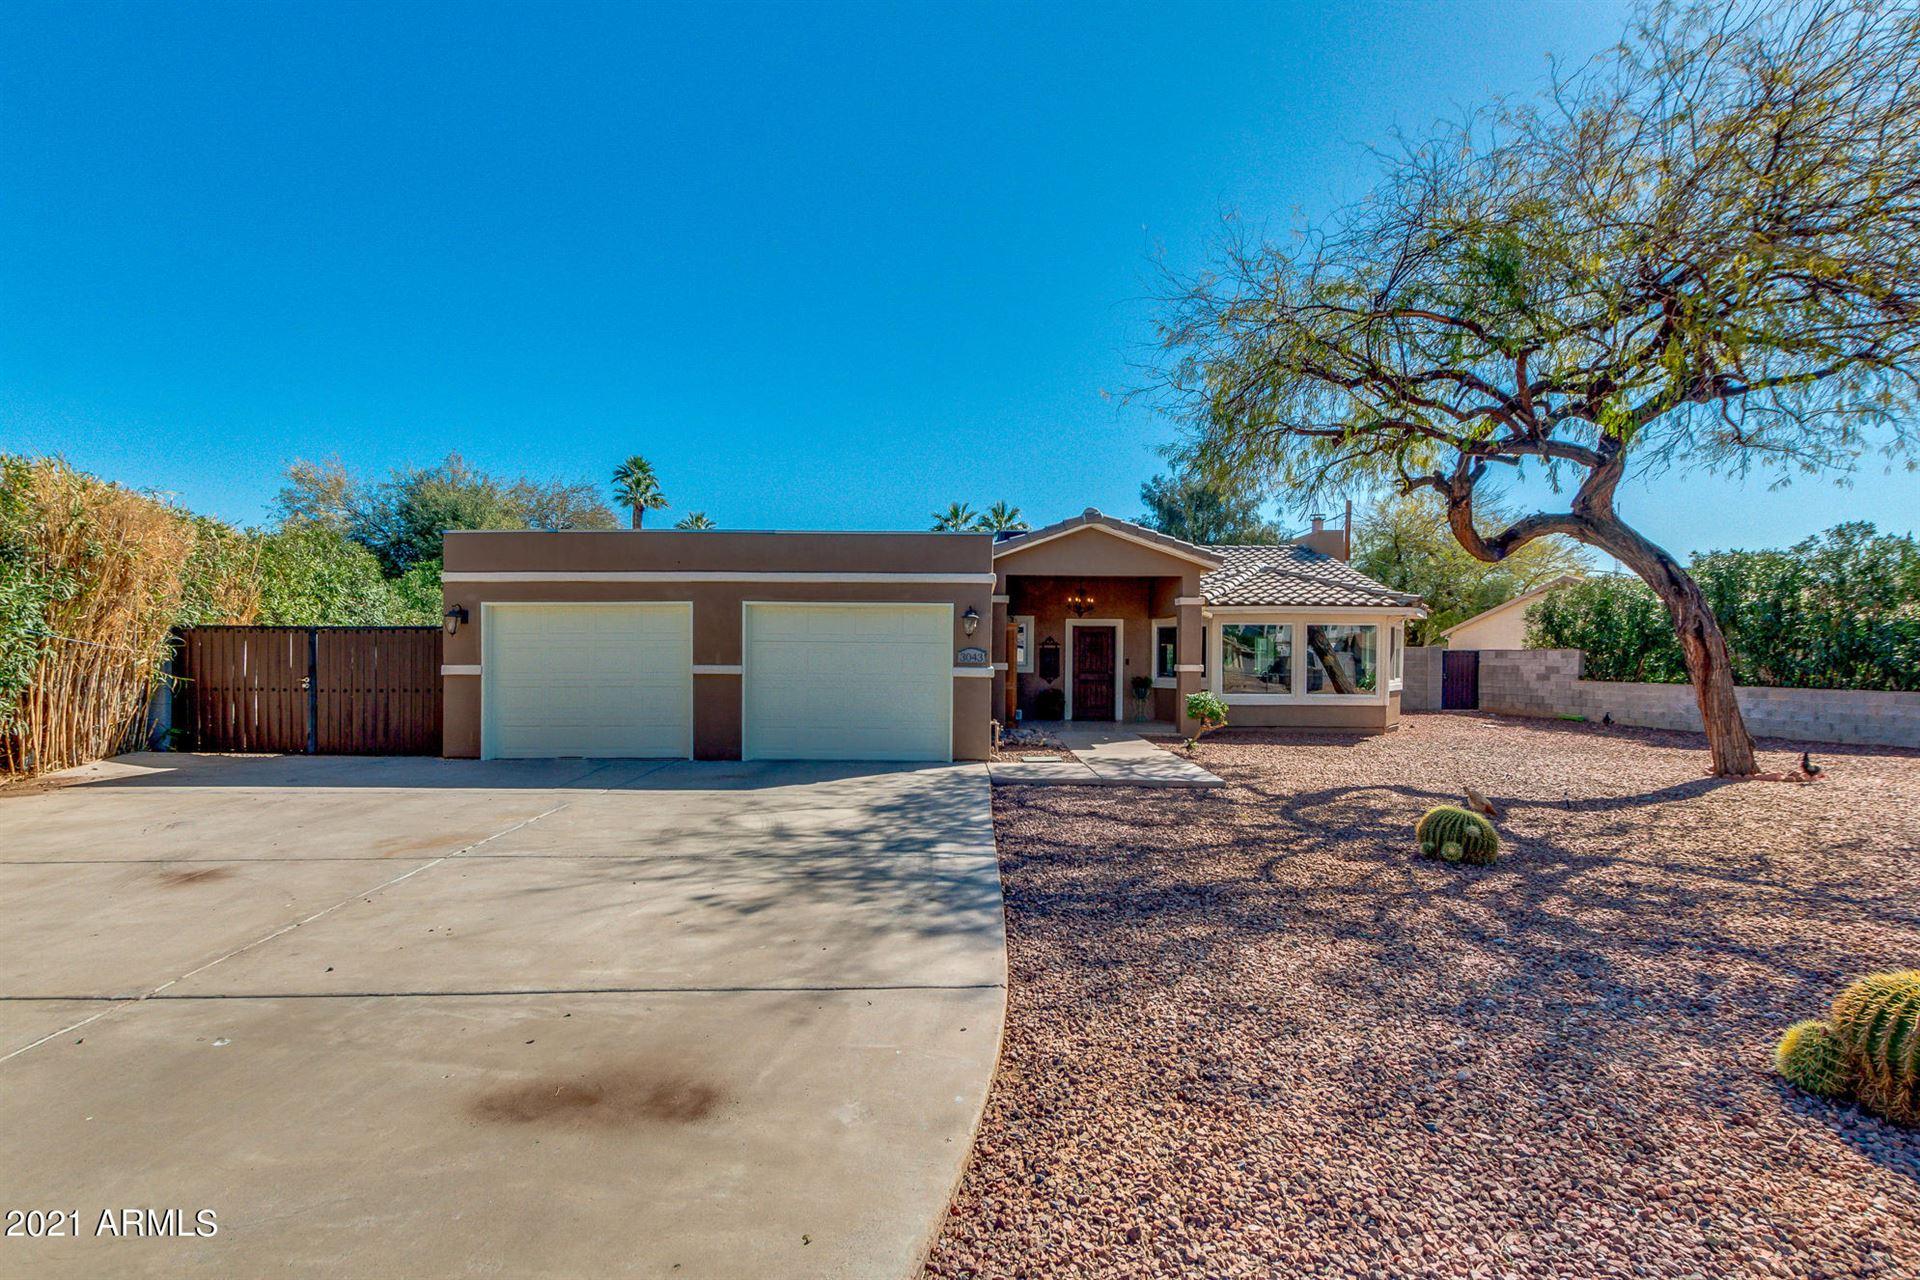 3043 N 34TH Street, Phoenix, AZ 85018 - MLS#: 6195871